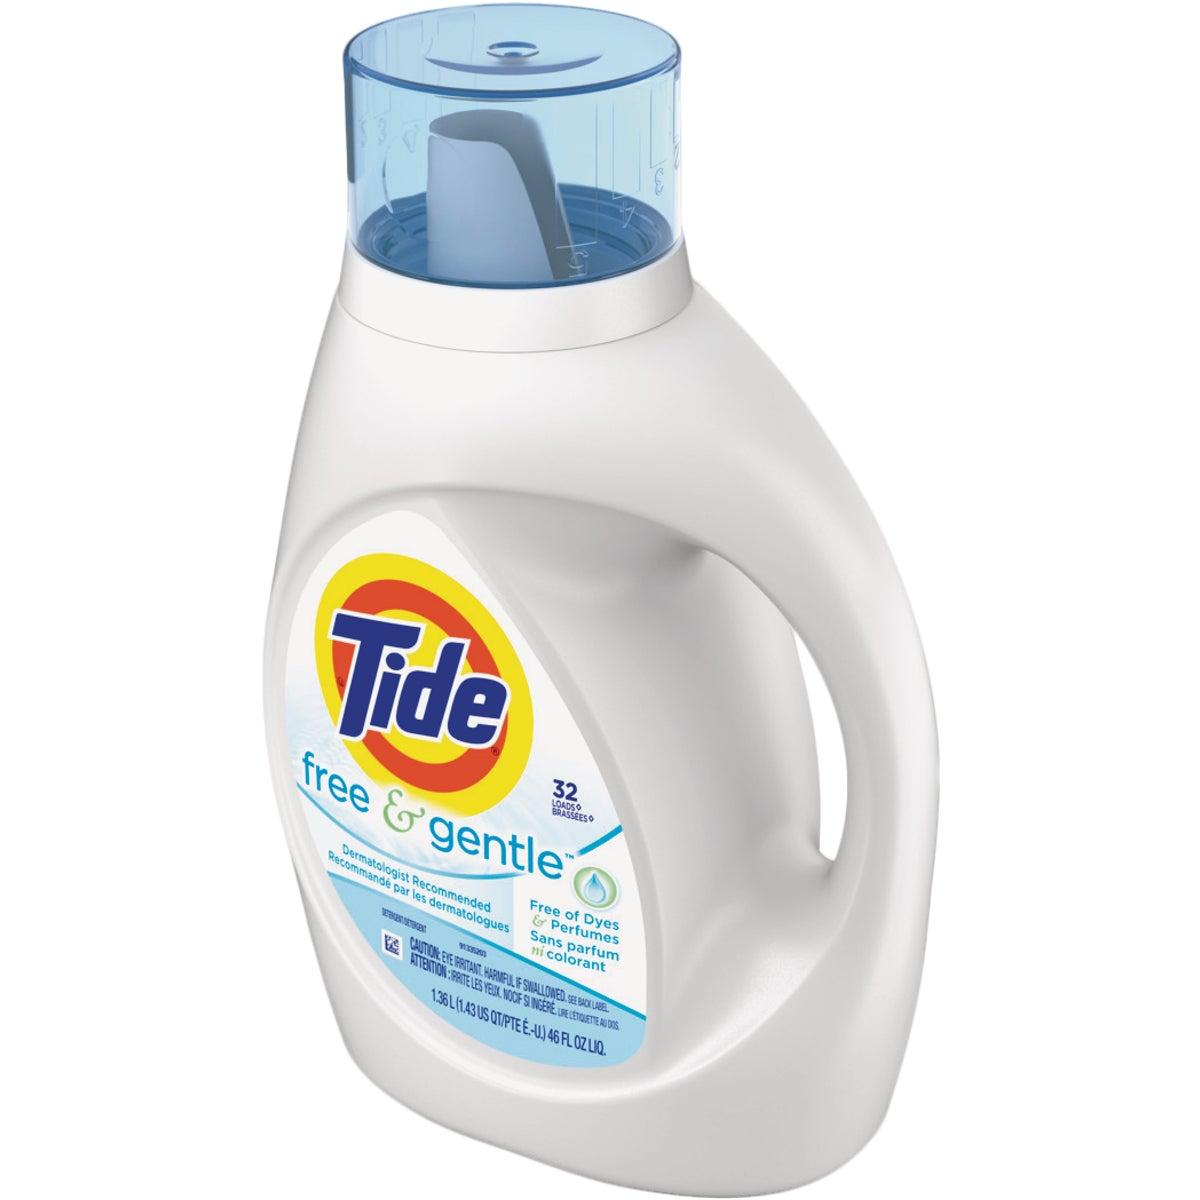 Tide Free & Gentle Liquid Laundry Detergent, 13885